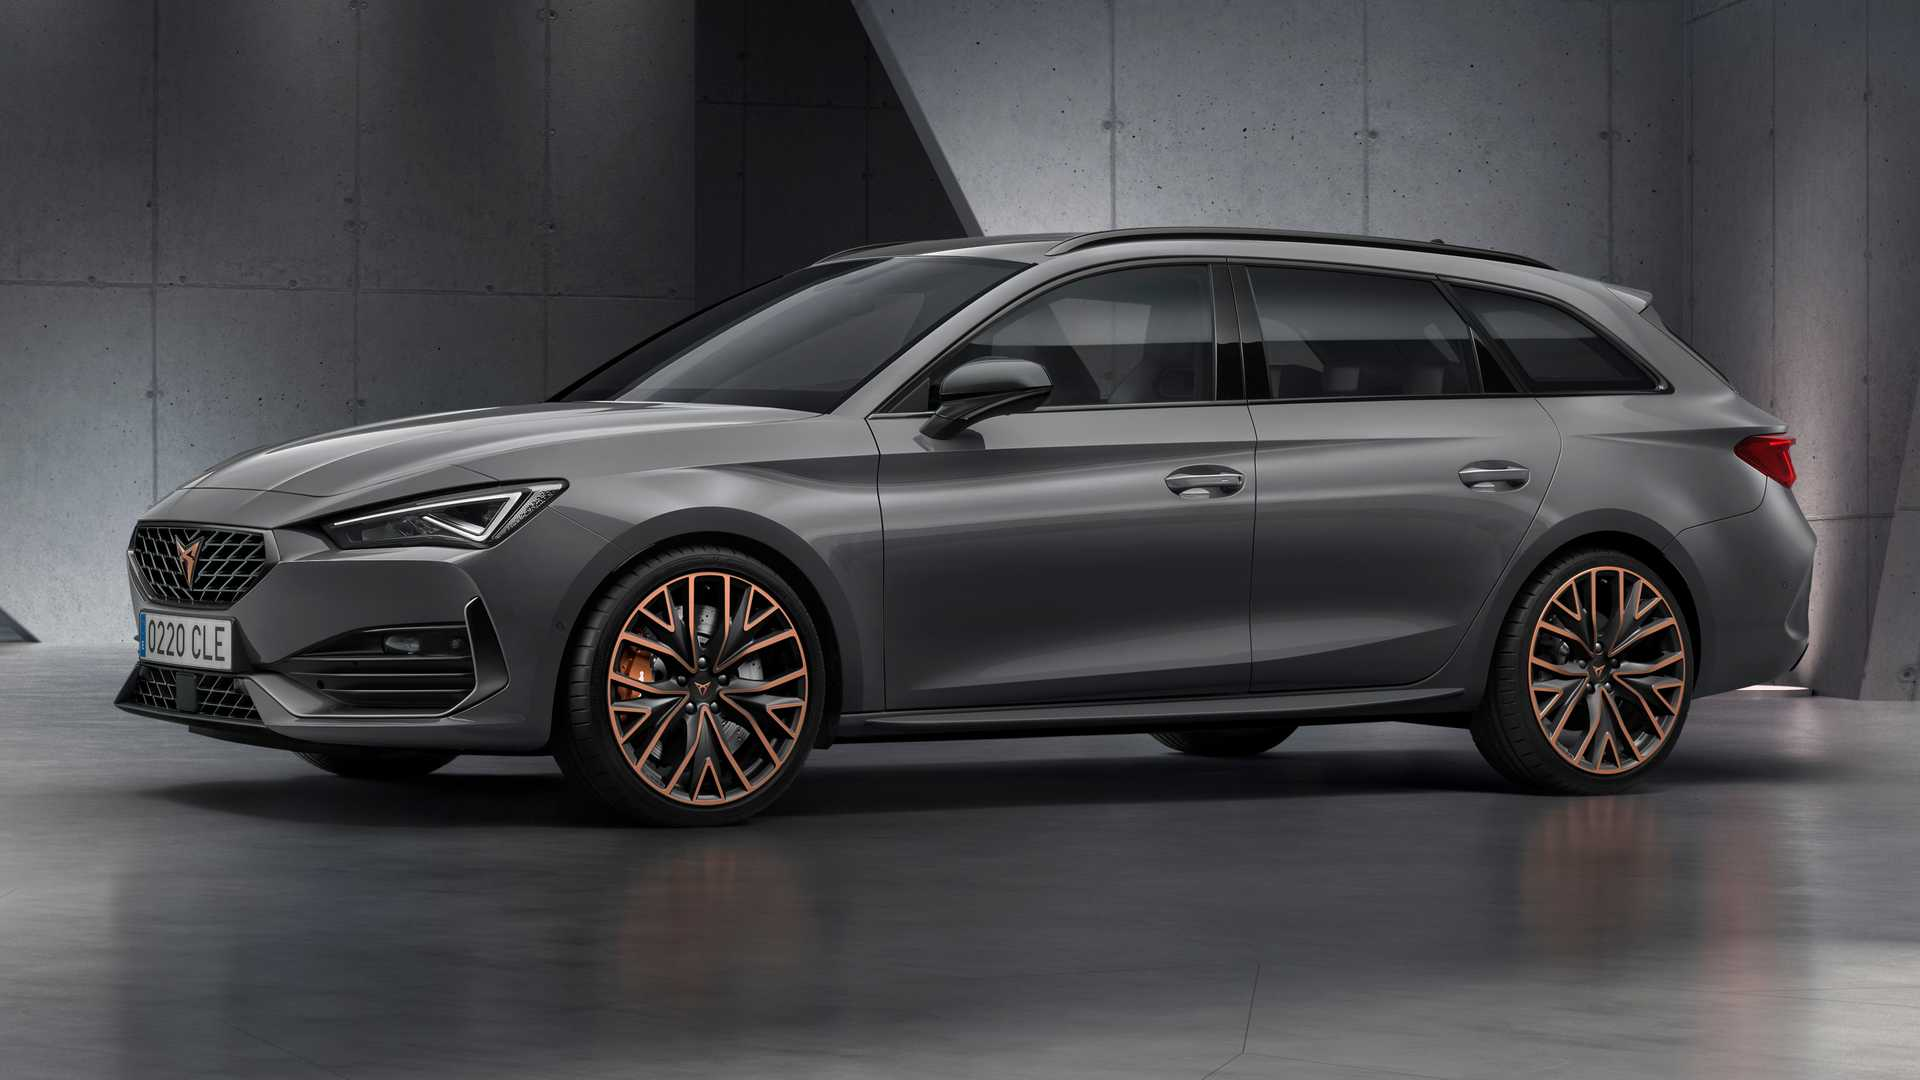 2021 Cupra Leon revealed with 306-bhp AWD estate, PHEV, no ...